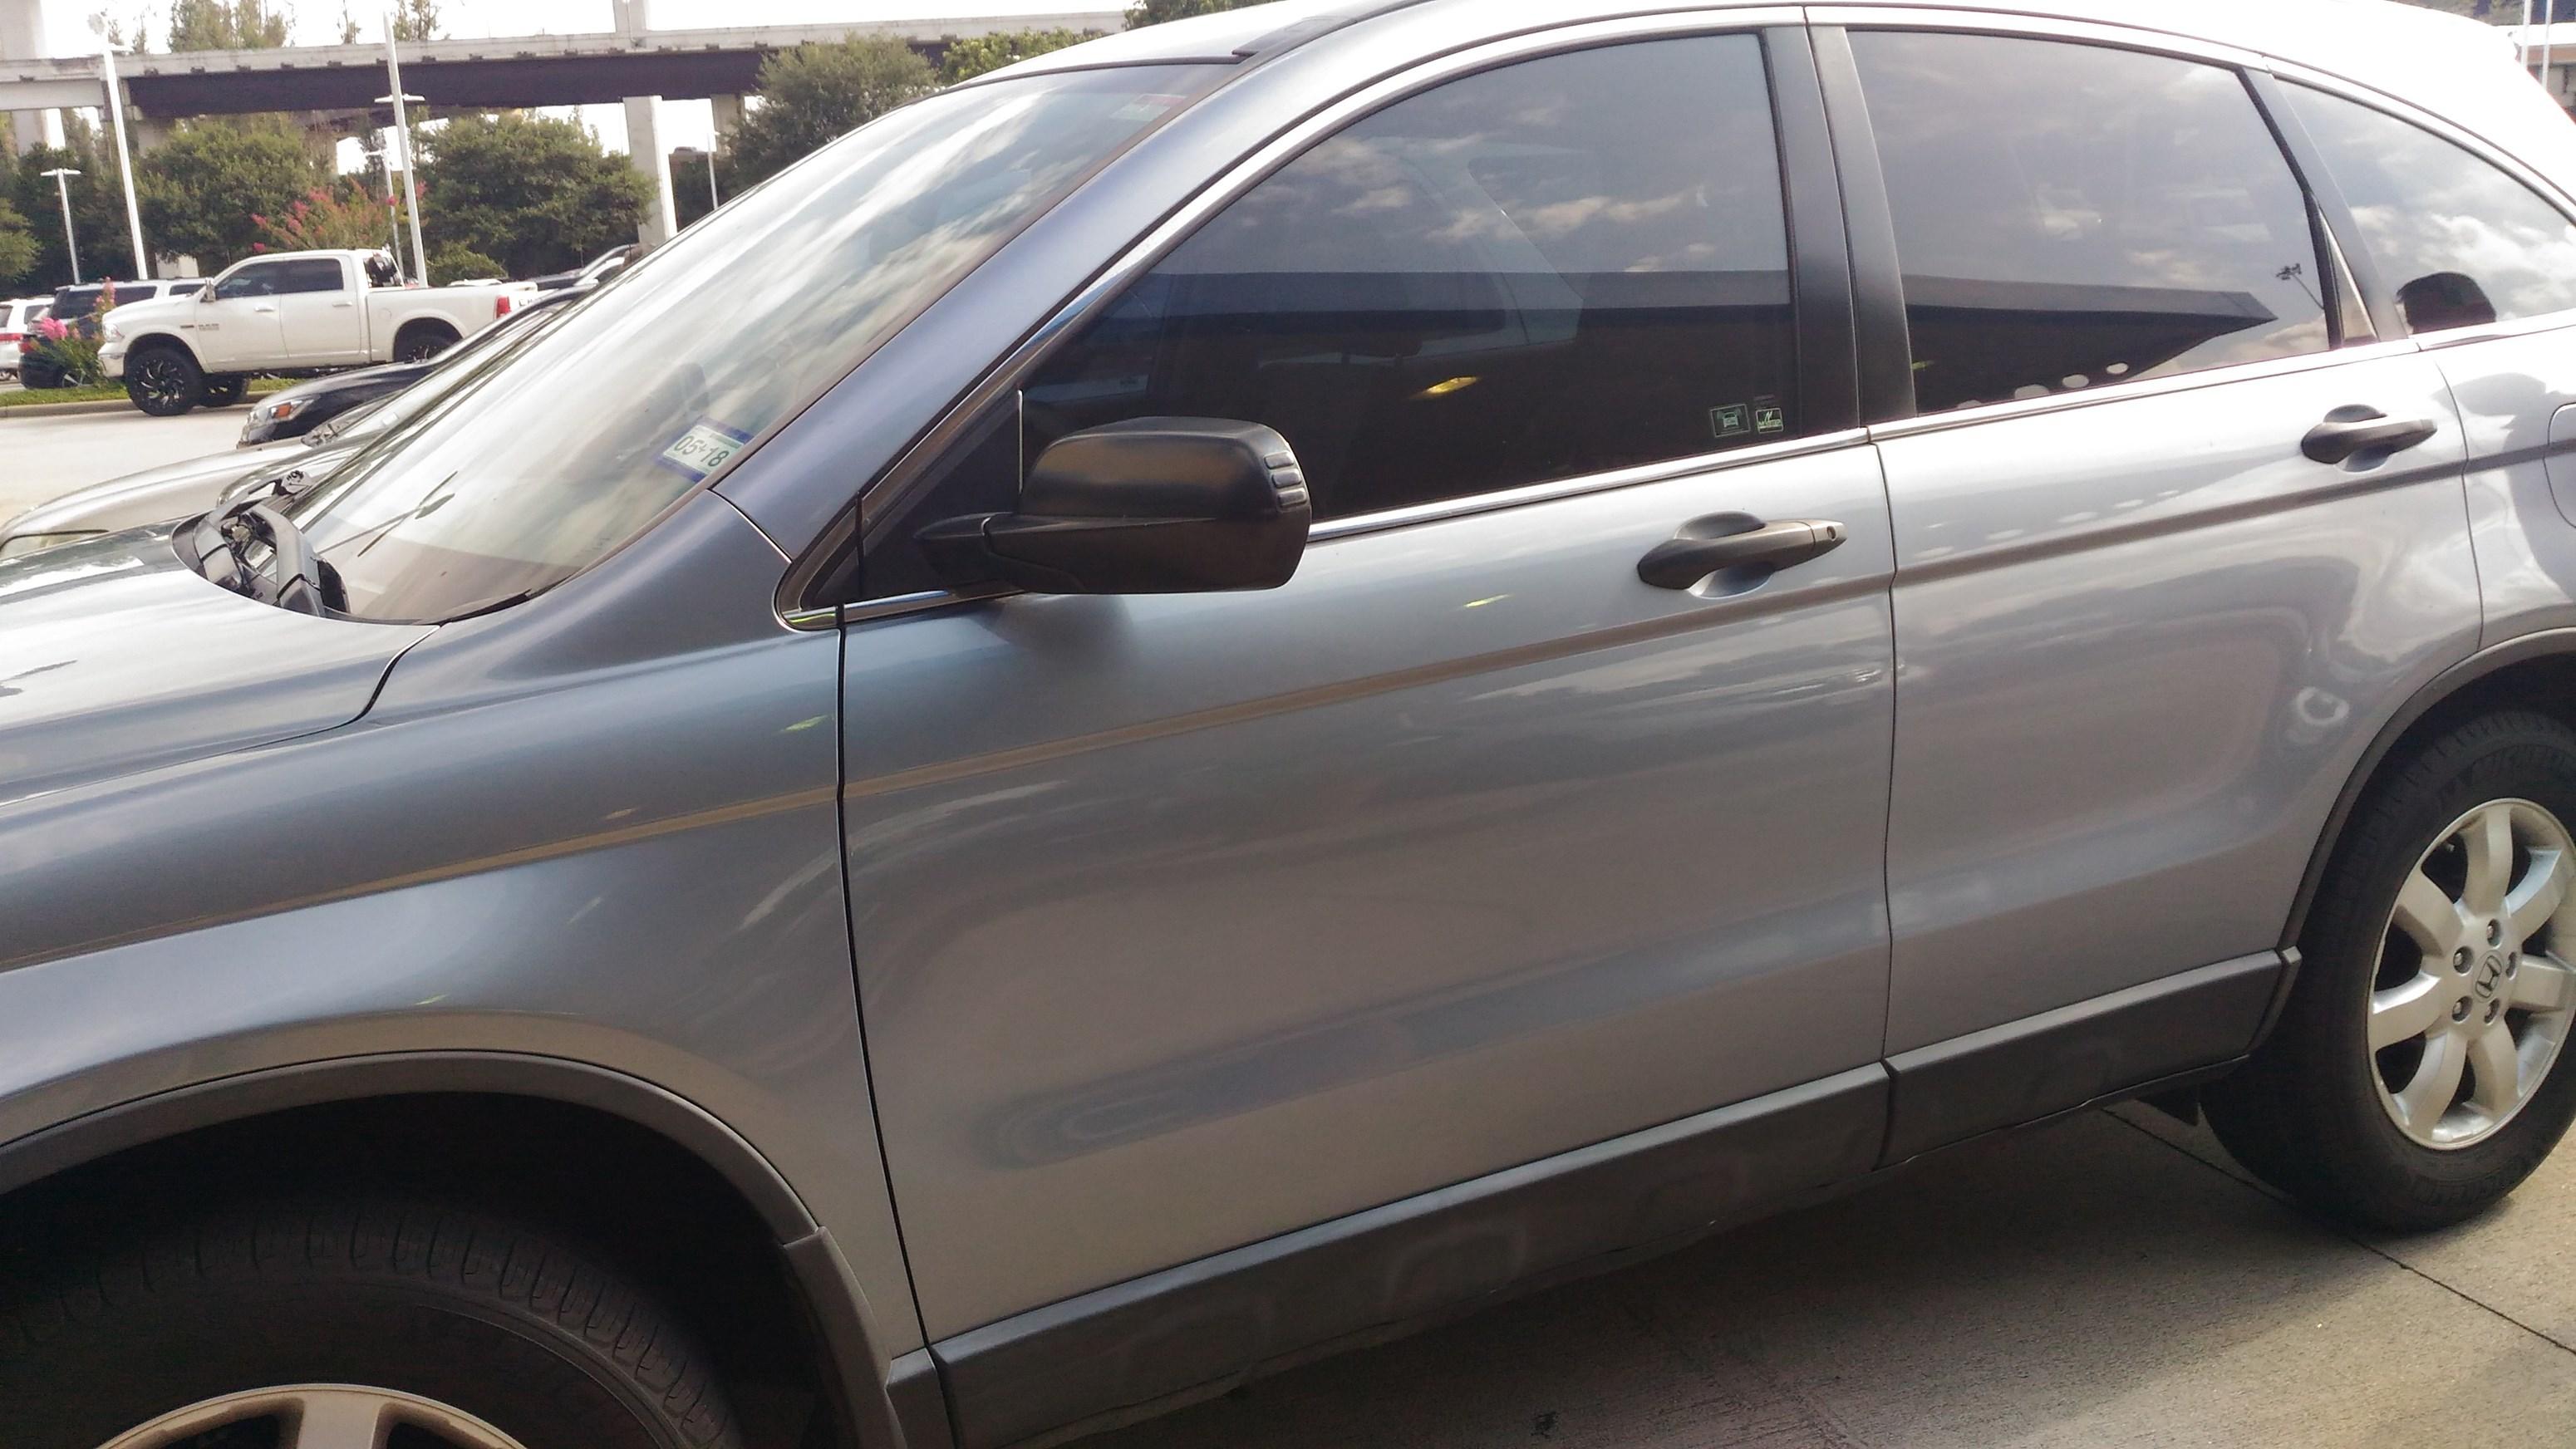 advert qatar sale vehicles for title living honda crv information